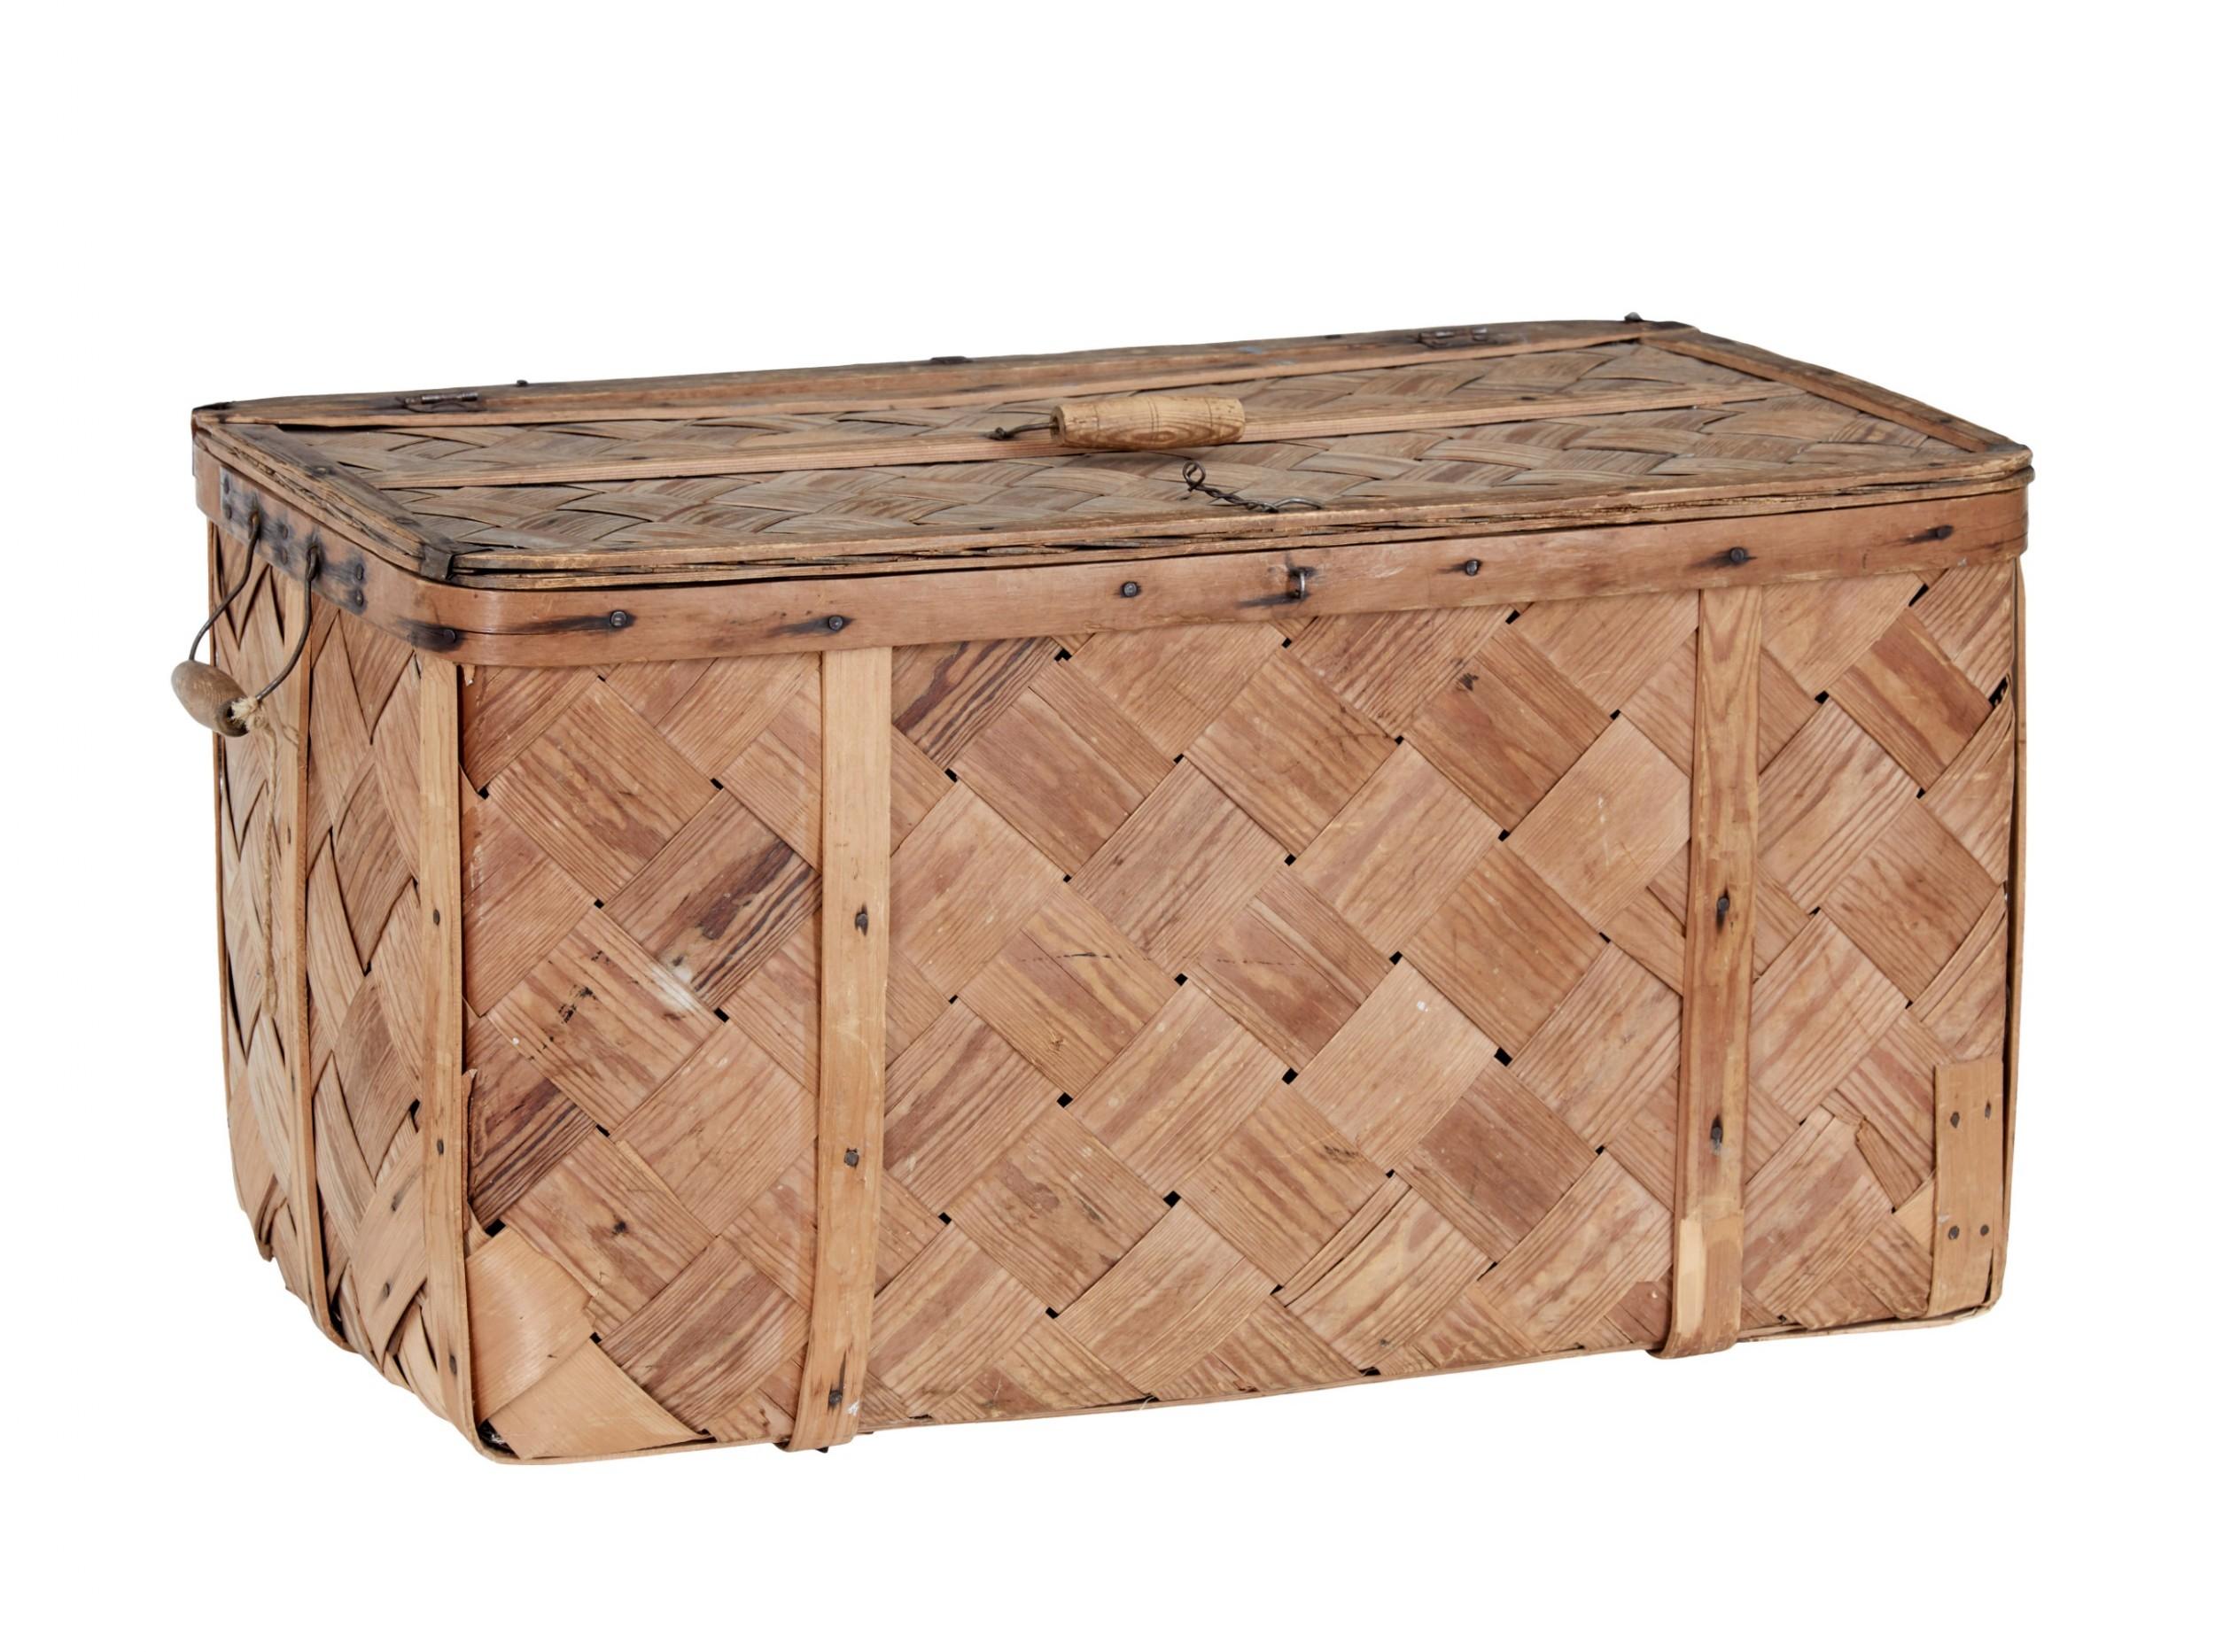 swedish 19th century woven pine basket